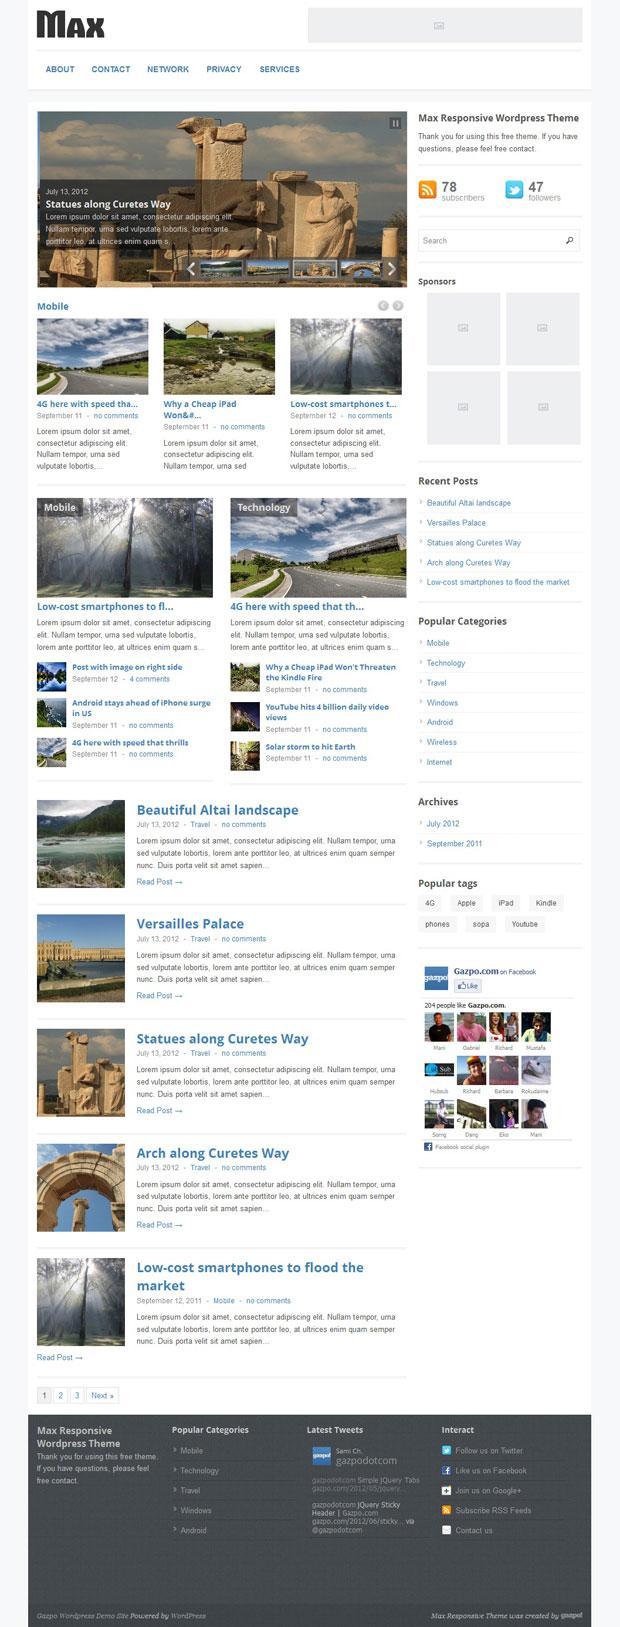 Max Magazine: A Responsive Wordpress Theme | Gazpo.com